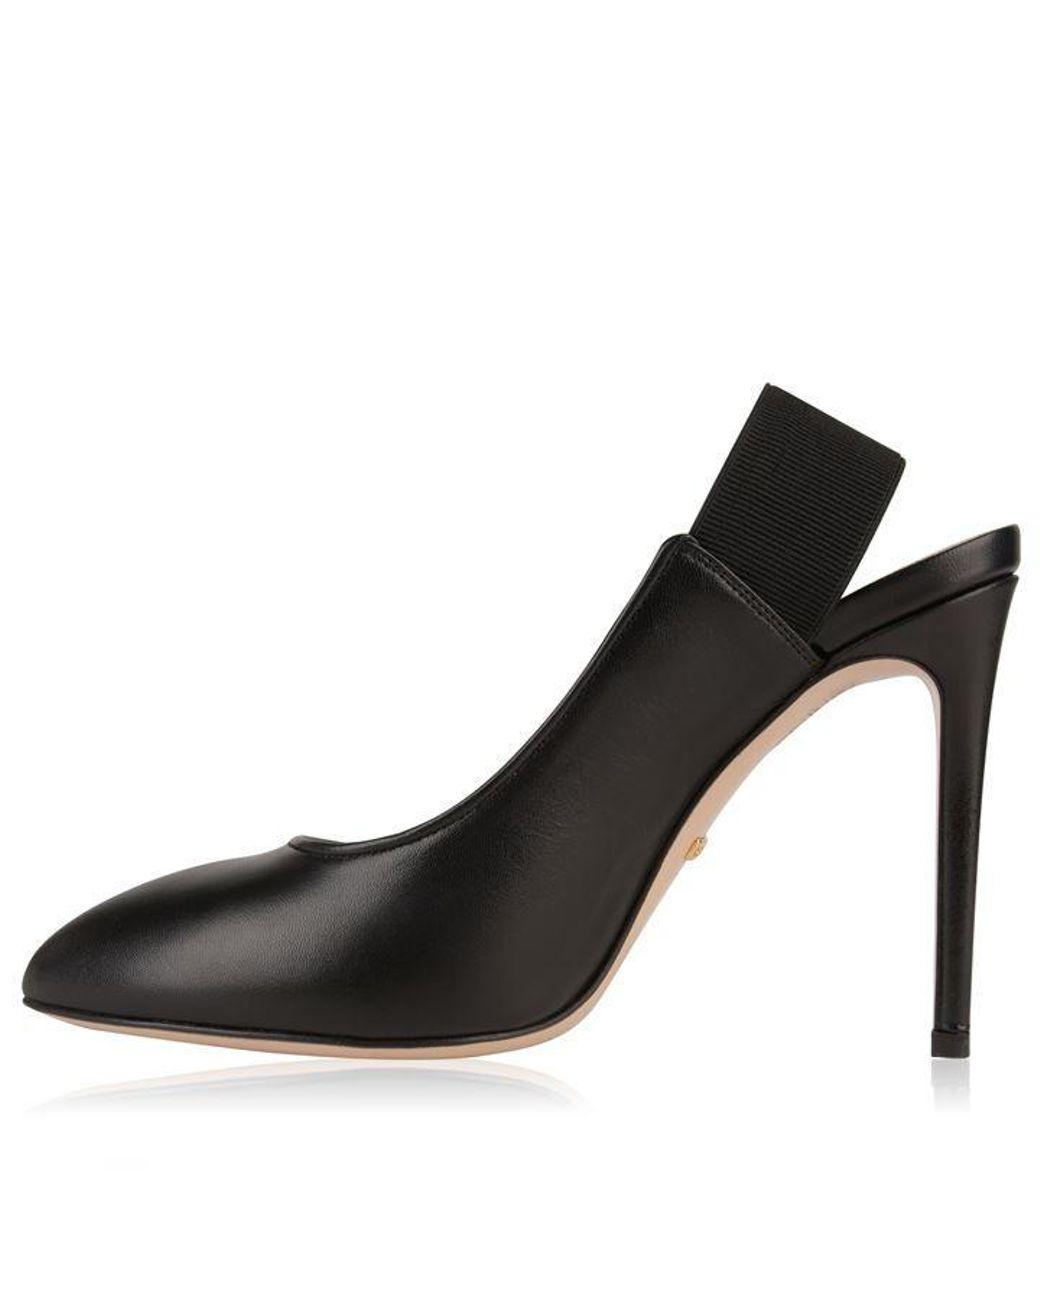 44b48c378 Gucci Sylvie Bee Heels in Black - Lyst